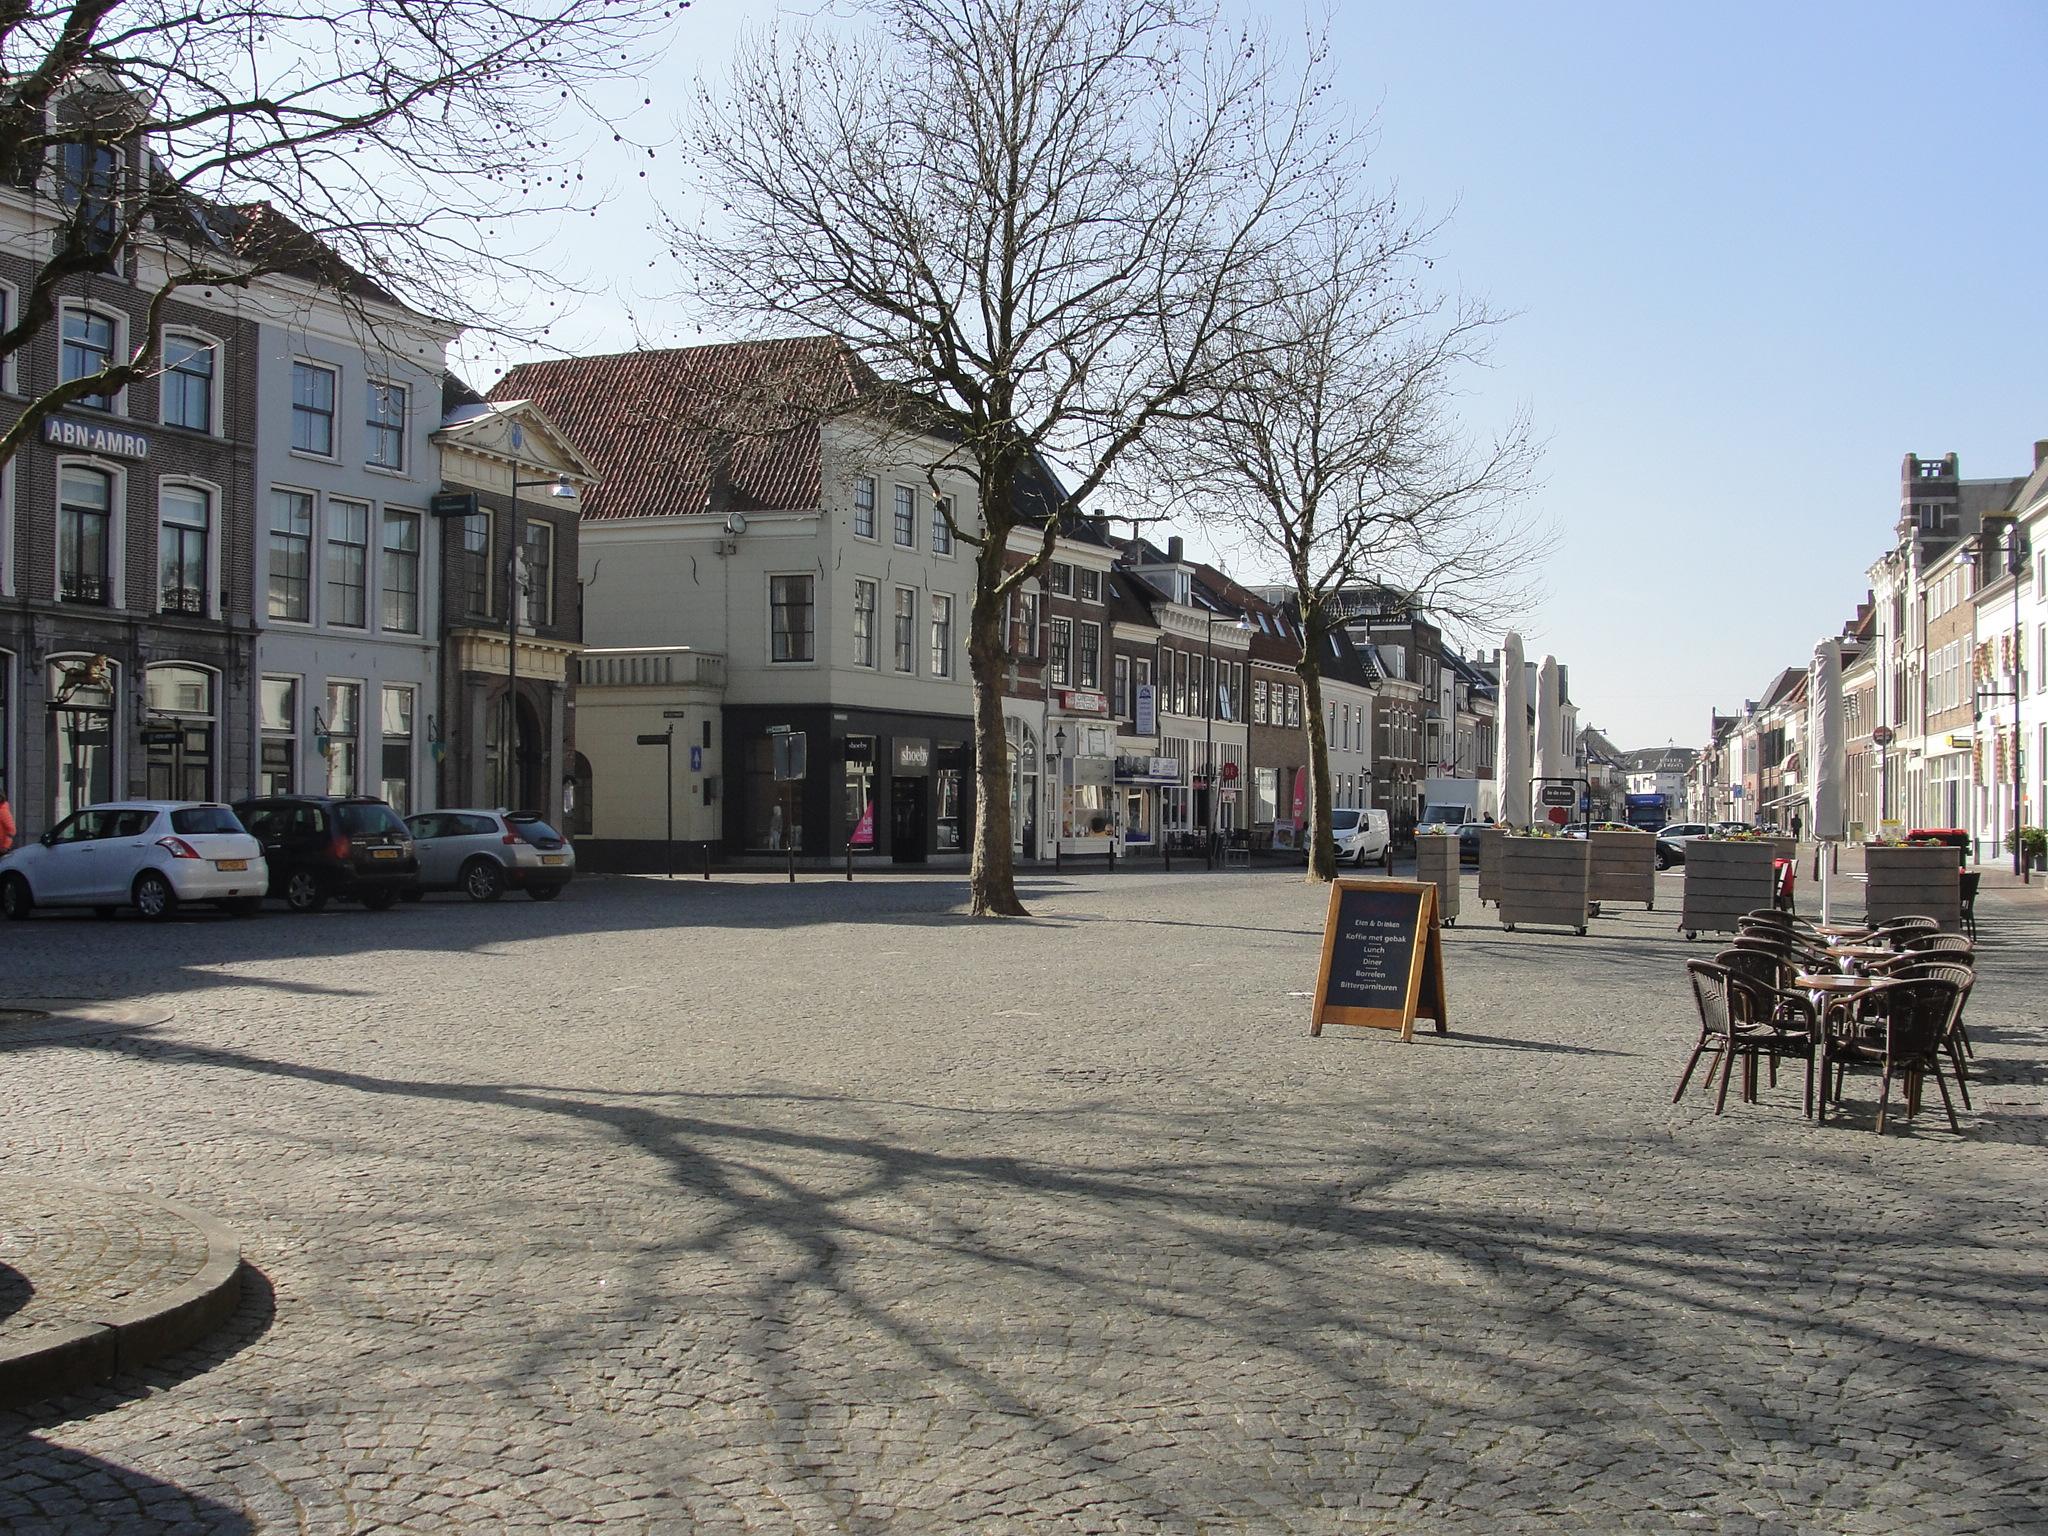 Pilot afsluiten Markt: autovrij maken binnenstad – gemeente Zaltbommel